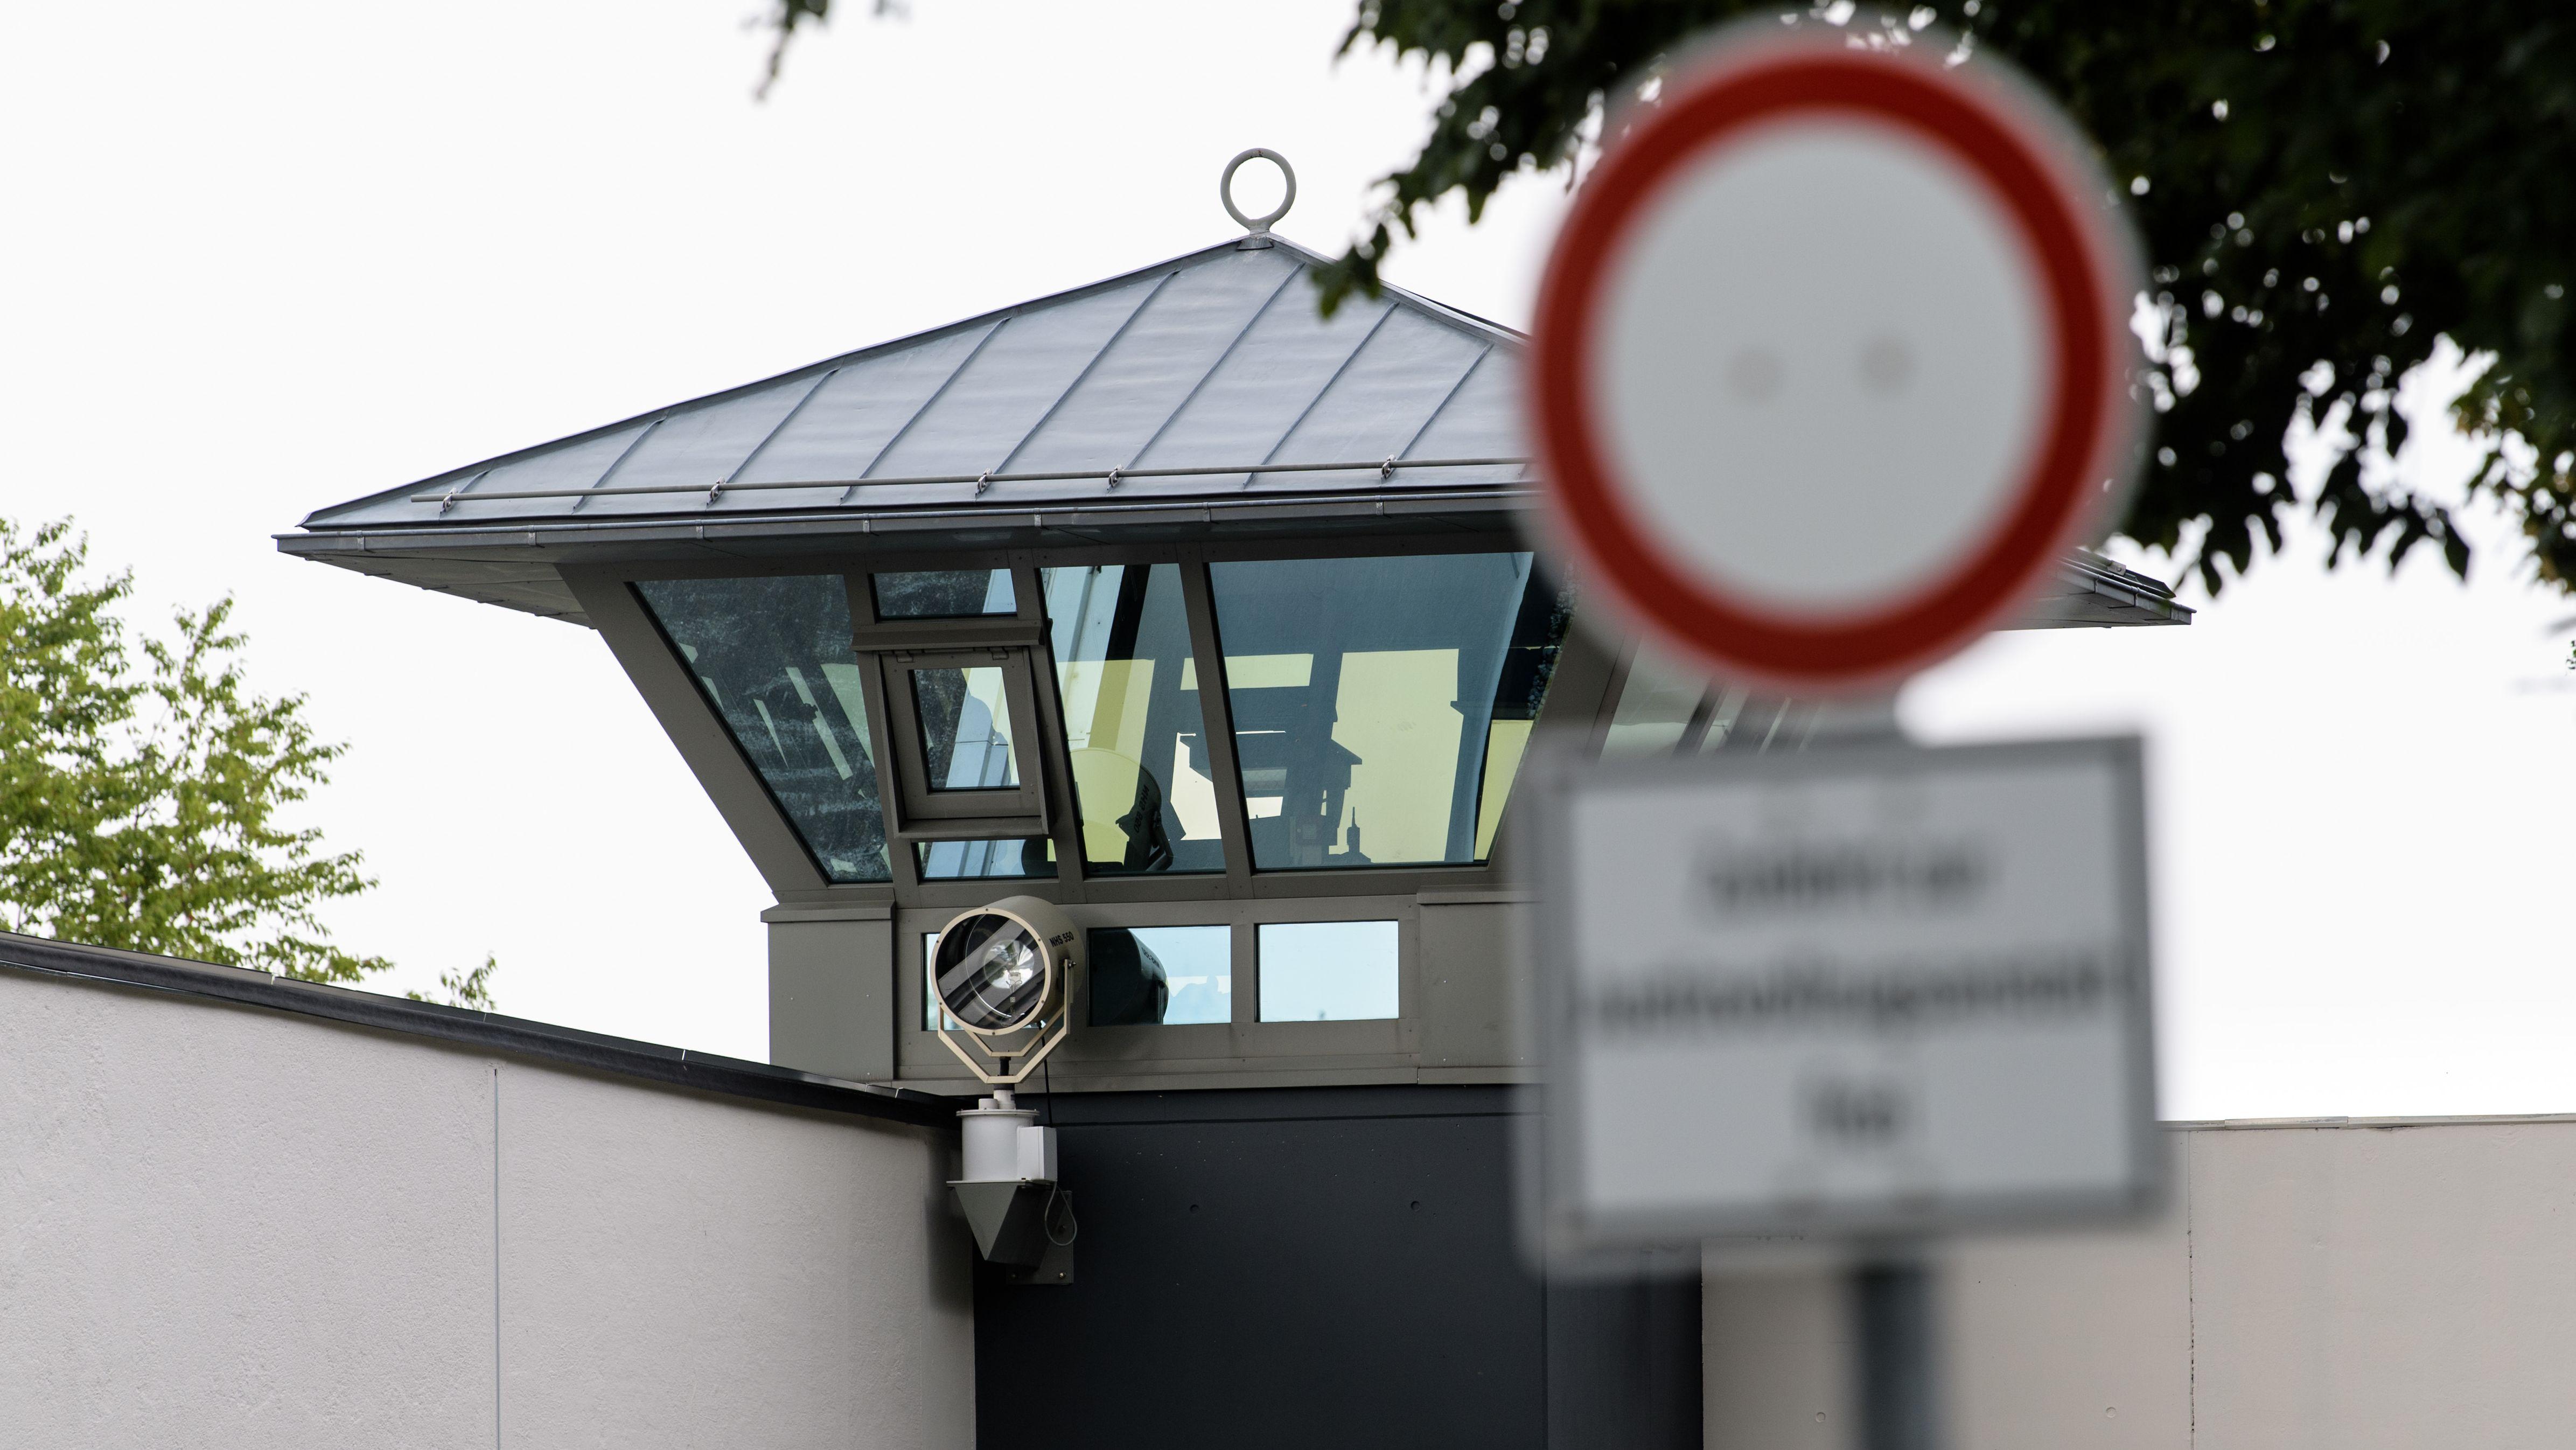 Wachturm der Justizvollzugsanstalt (JVA) München Stadelheim